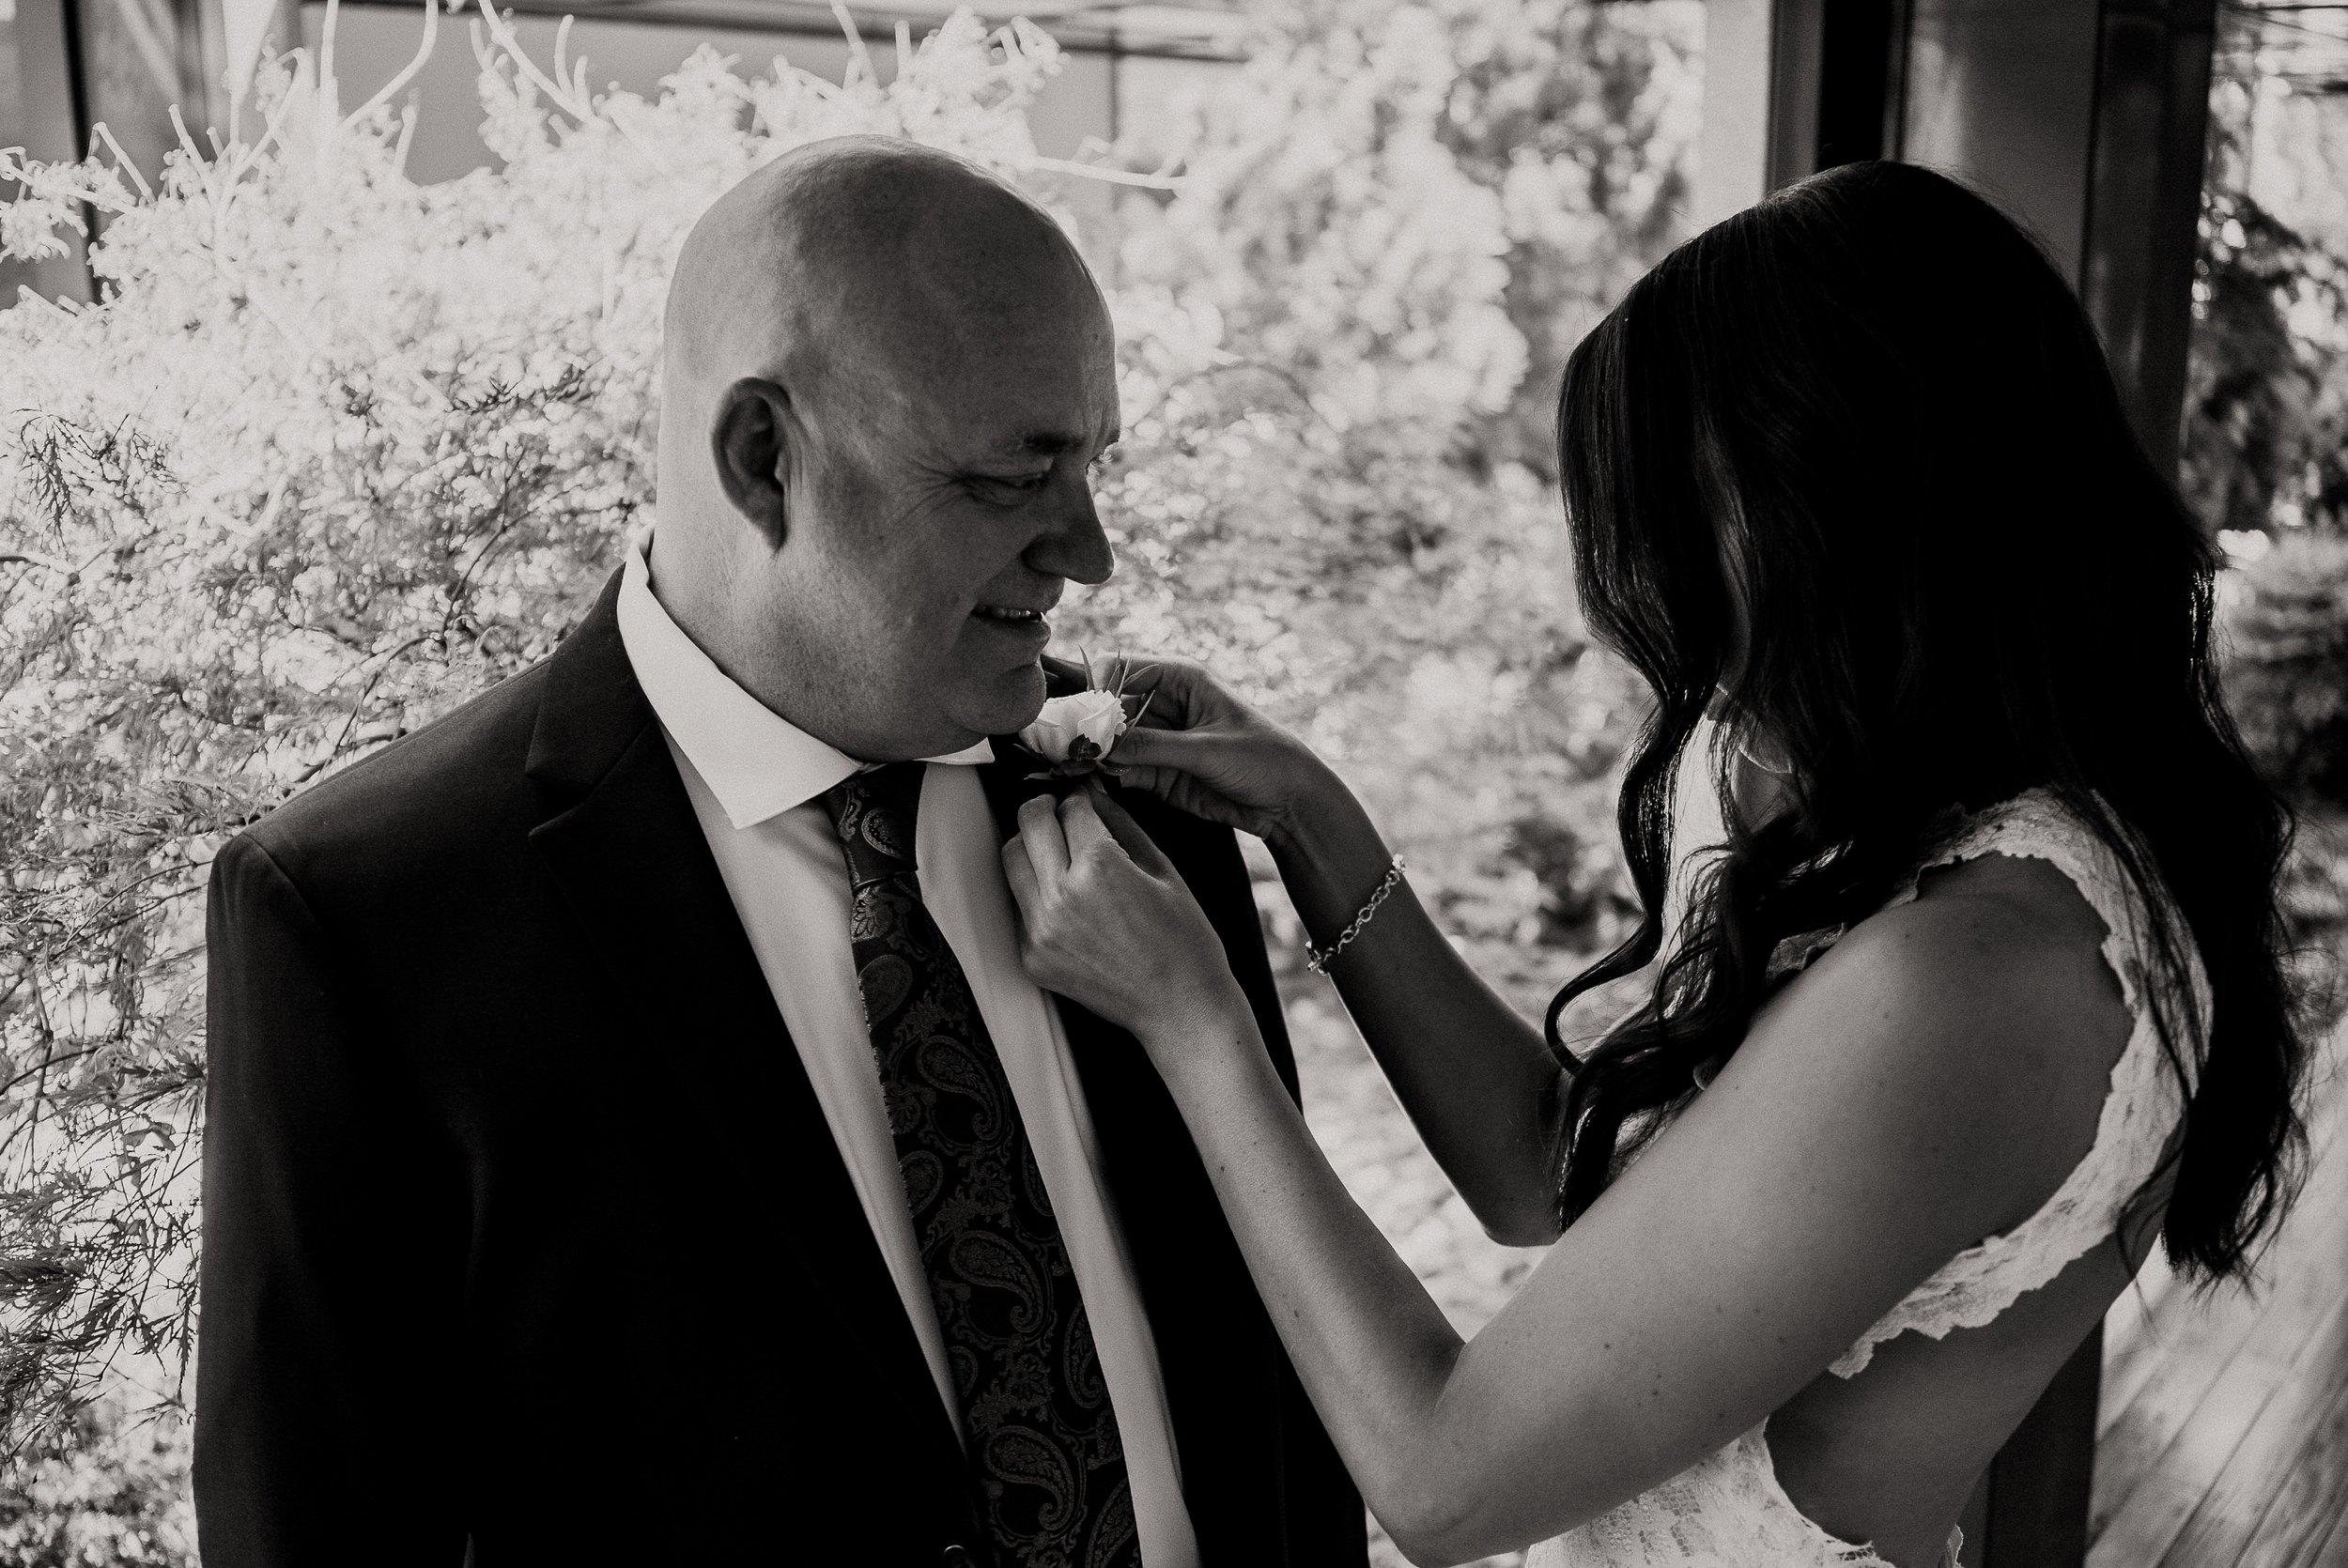 mickalathomas_puremacphotography_weddingphotographer_couplephotographer_Sheppartonphotographer_2706.jpg